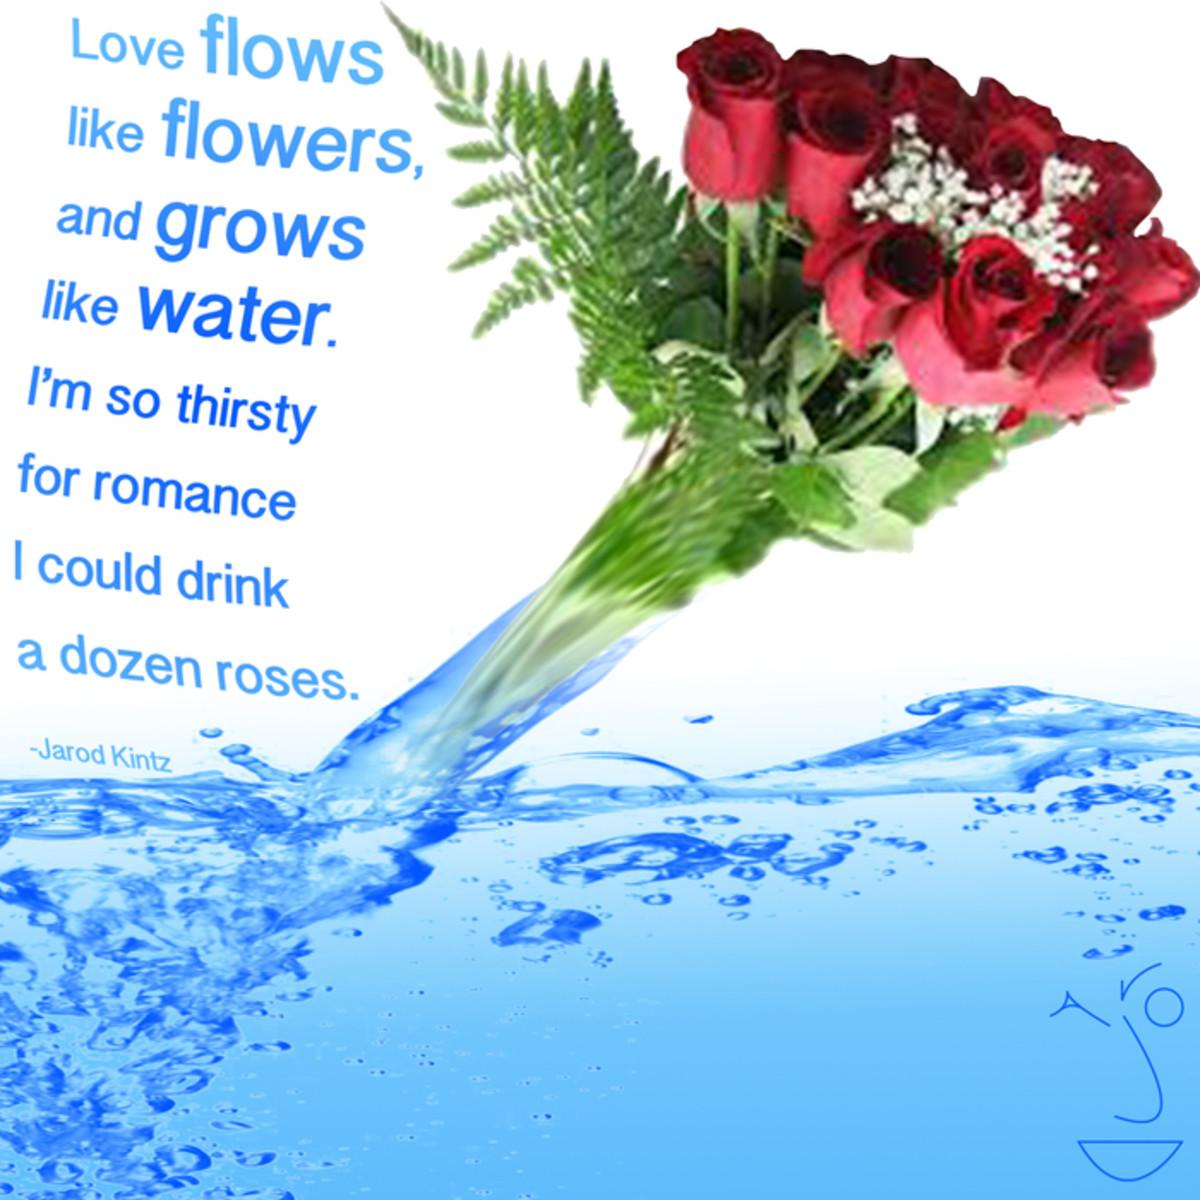 o-love-pour-into-my-heart-your-golden-silence-mondays-inspiration-80-to-jk-moondot